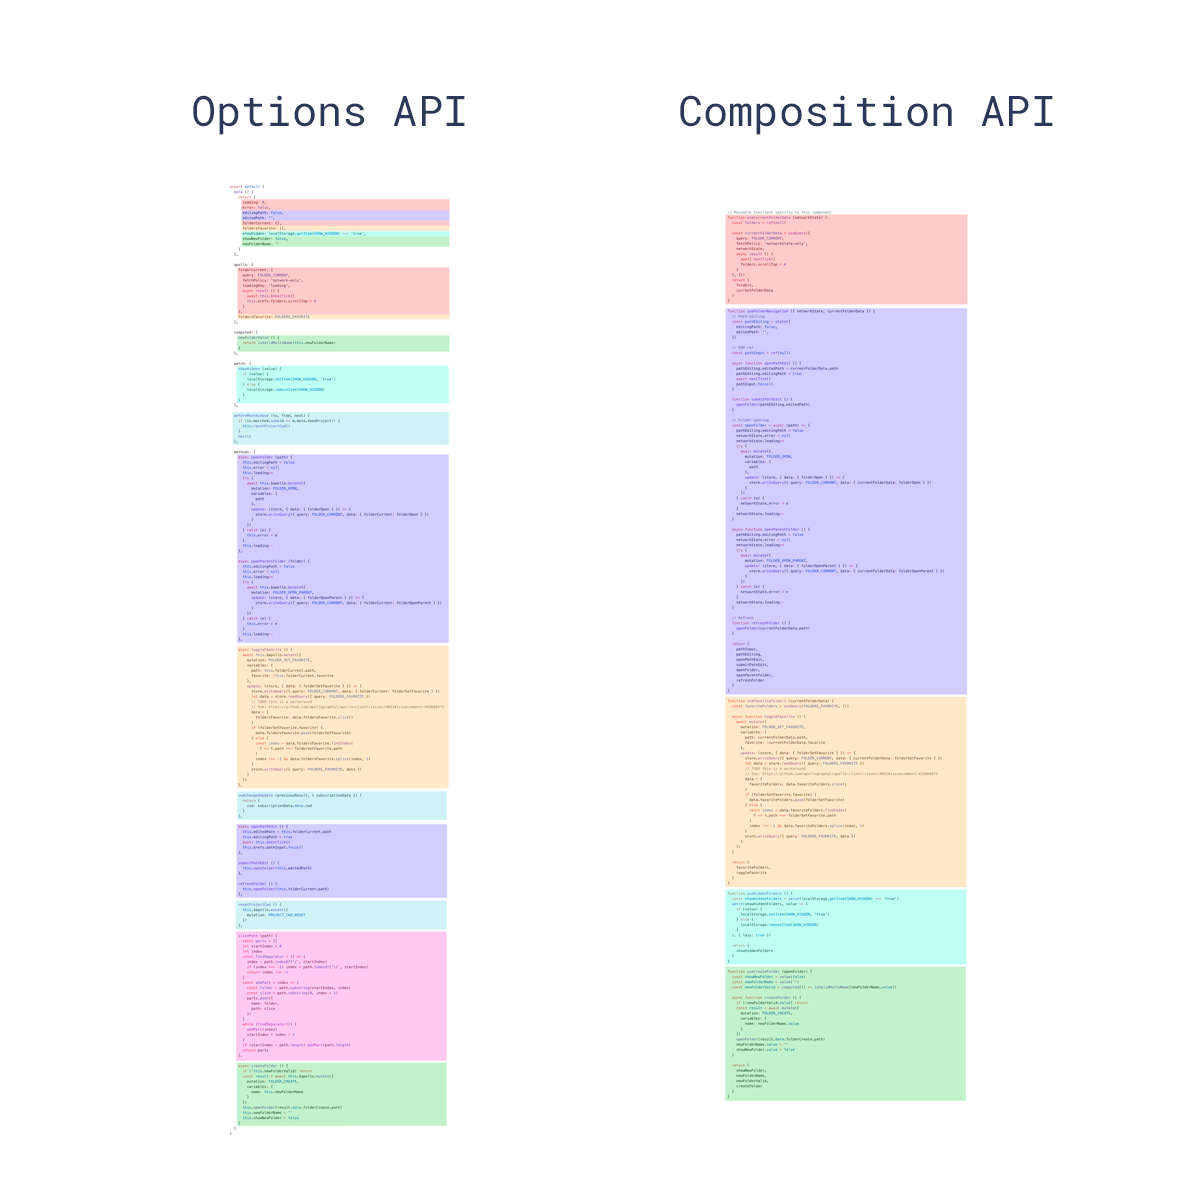 Vue 3 Composition API vs Options API code structure